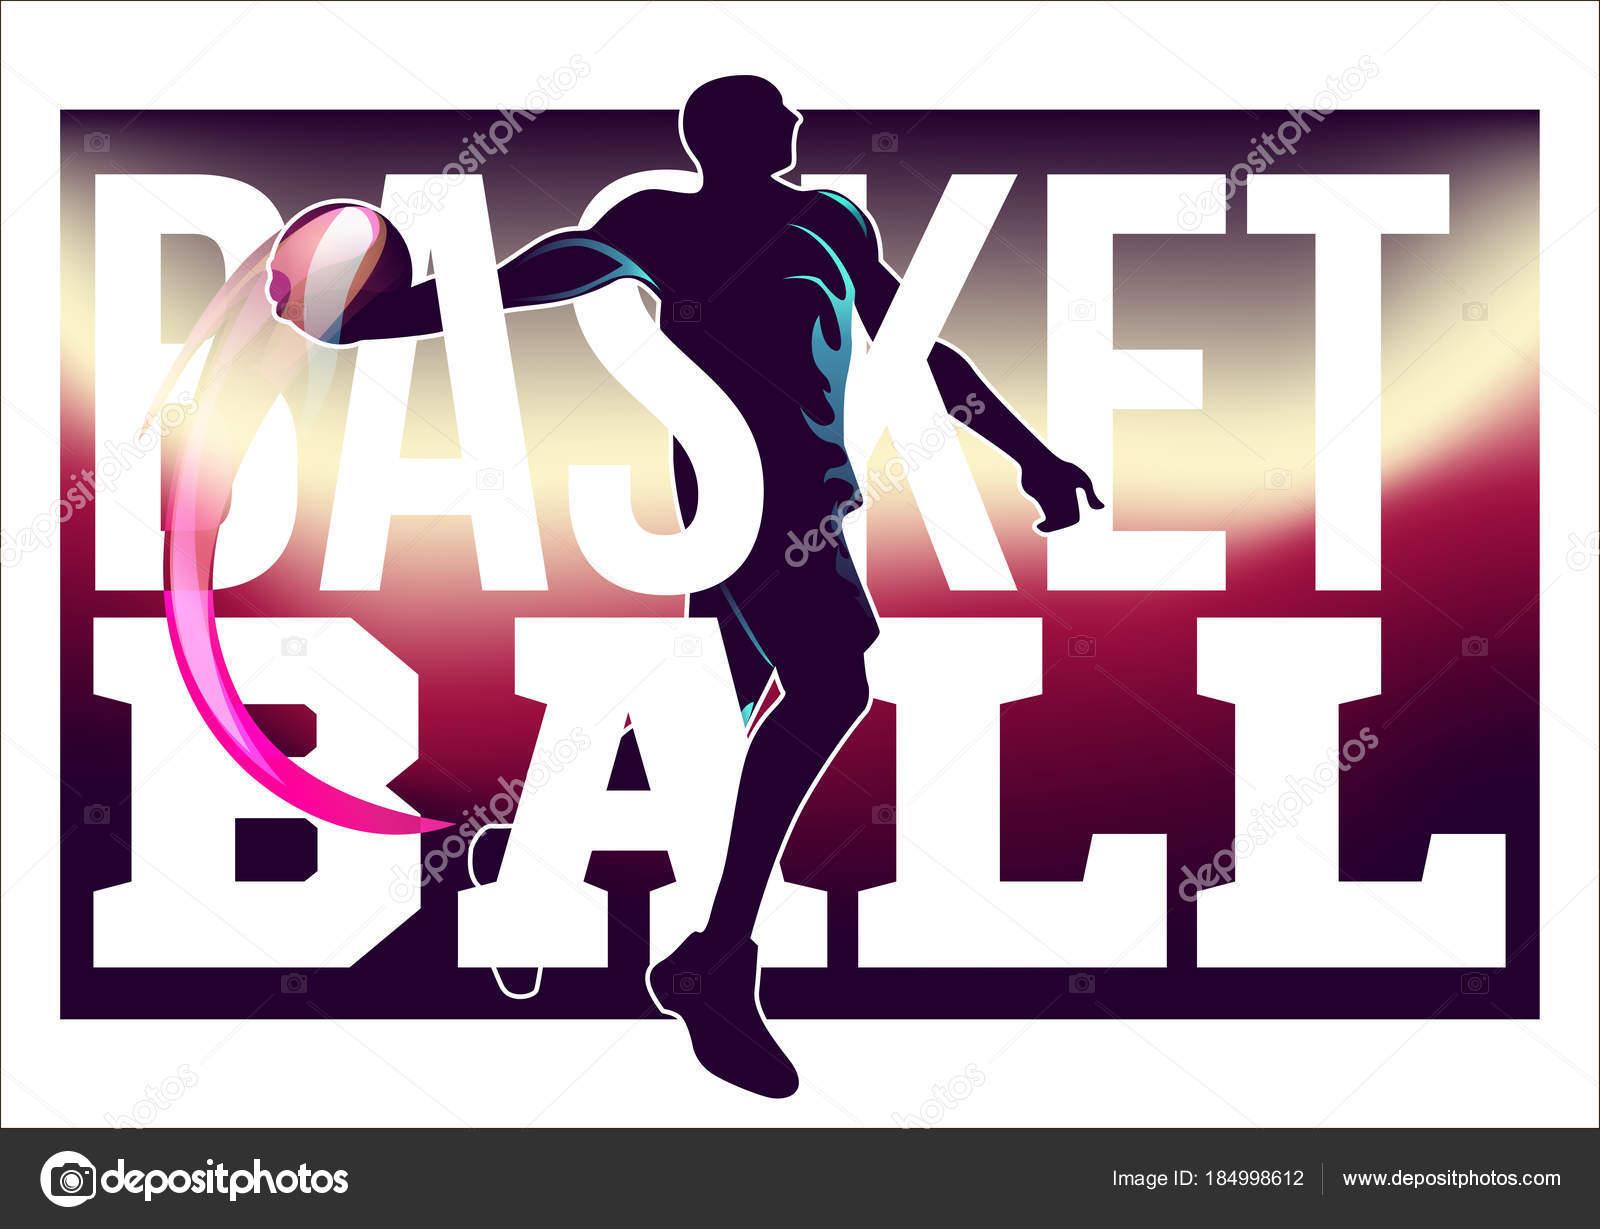 Basketball-Turnier-flyer — Stockvektor © Pechenuh #184998612